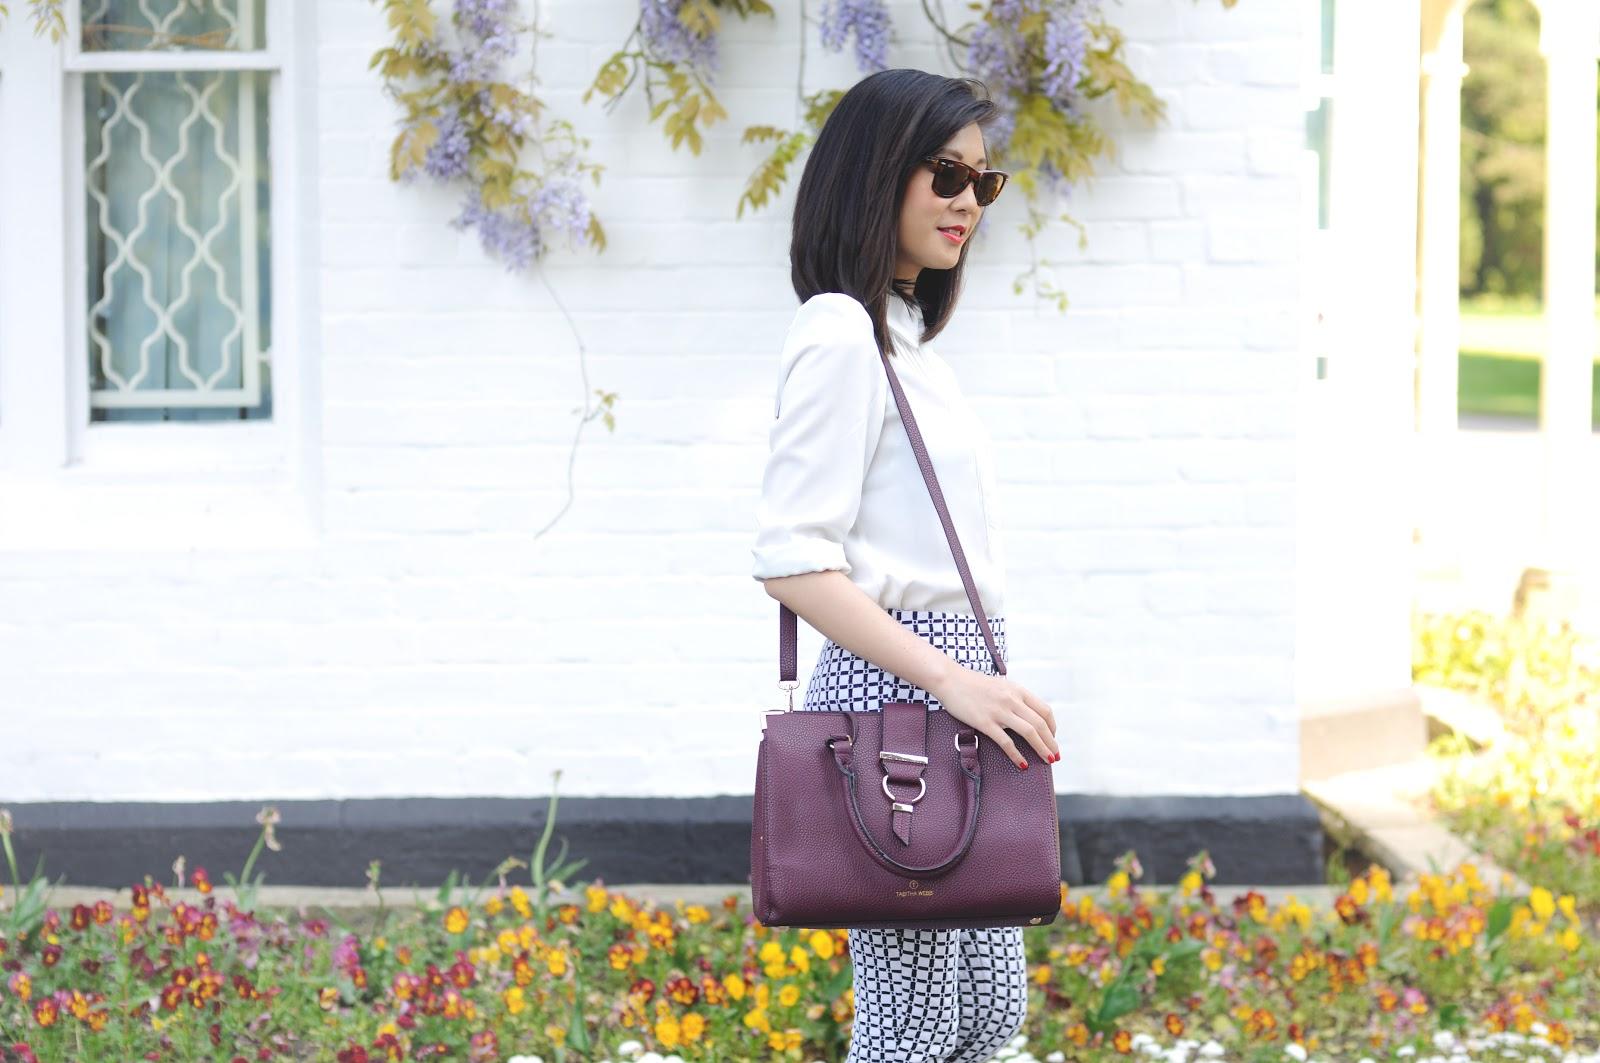 uk fashion blogger, avon tabitha webb handbag accessories collection